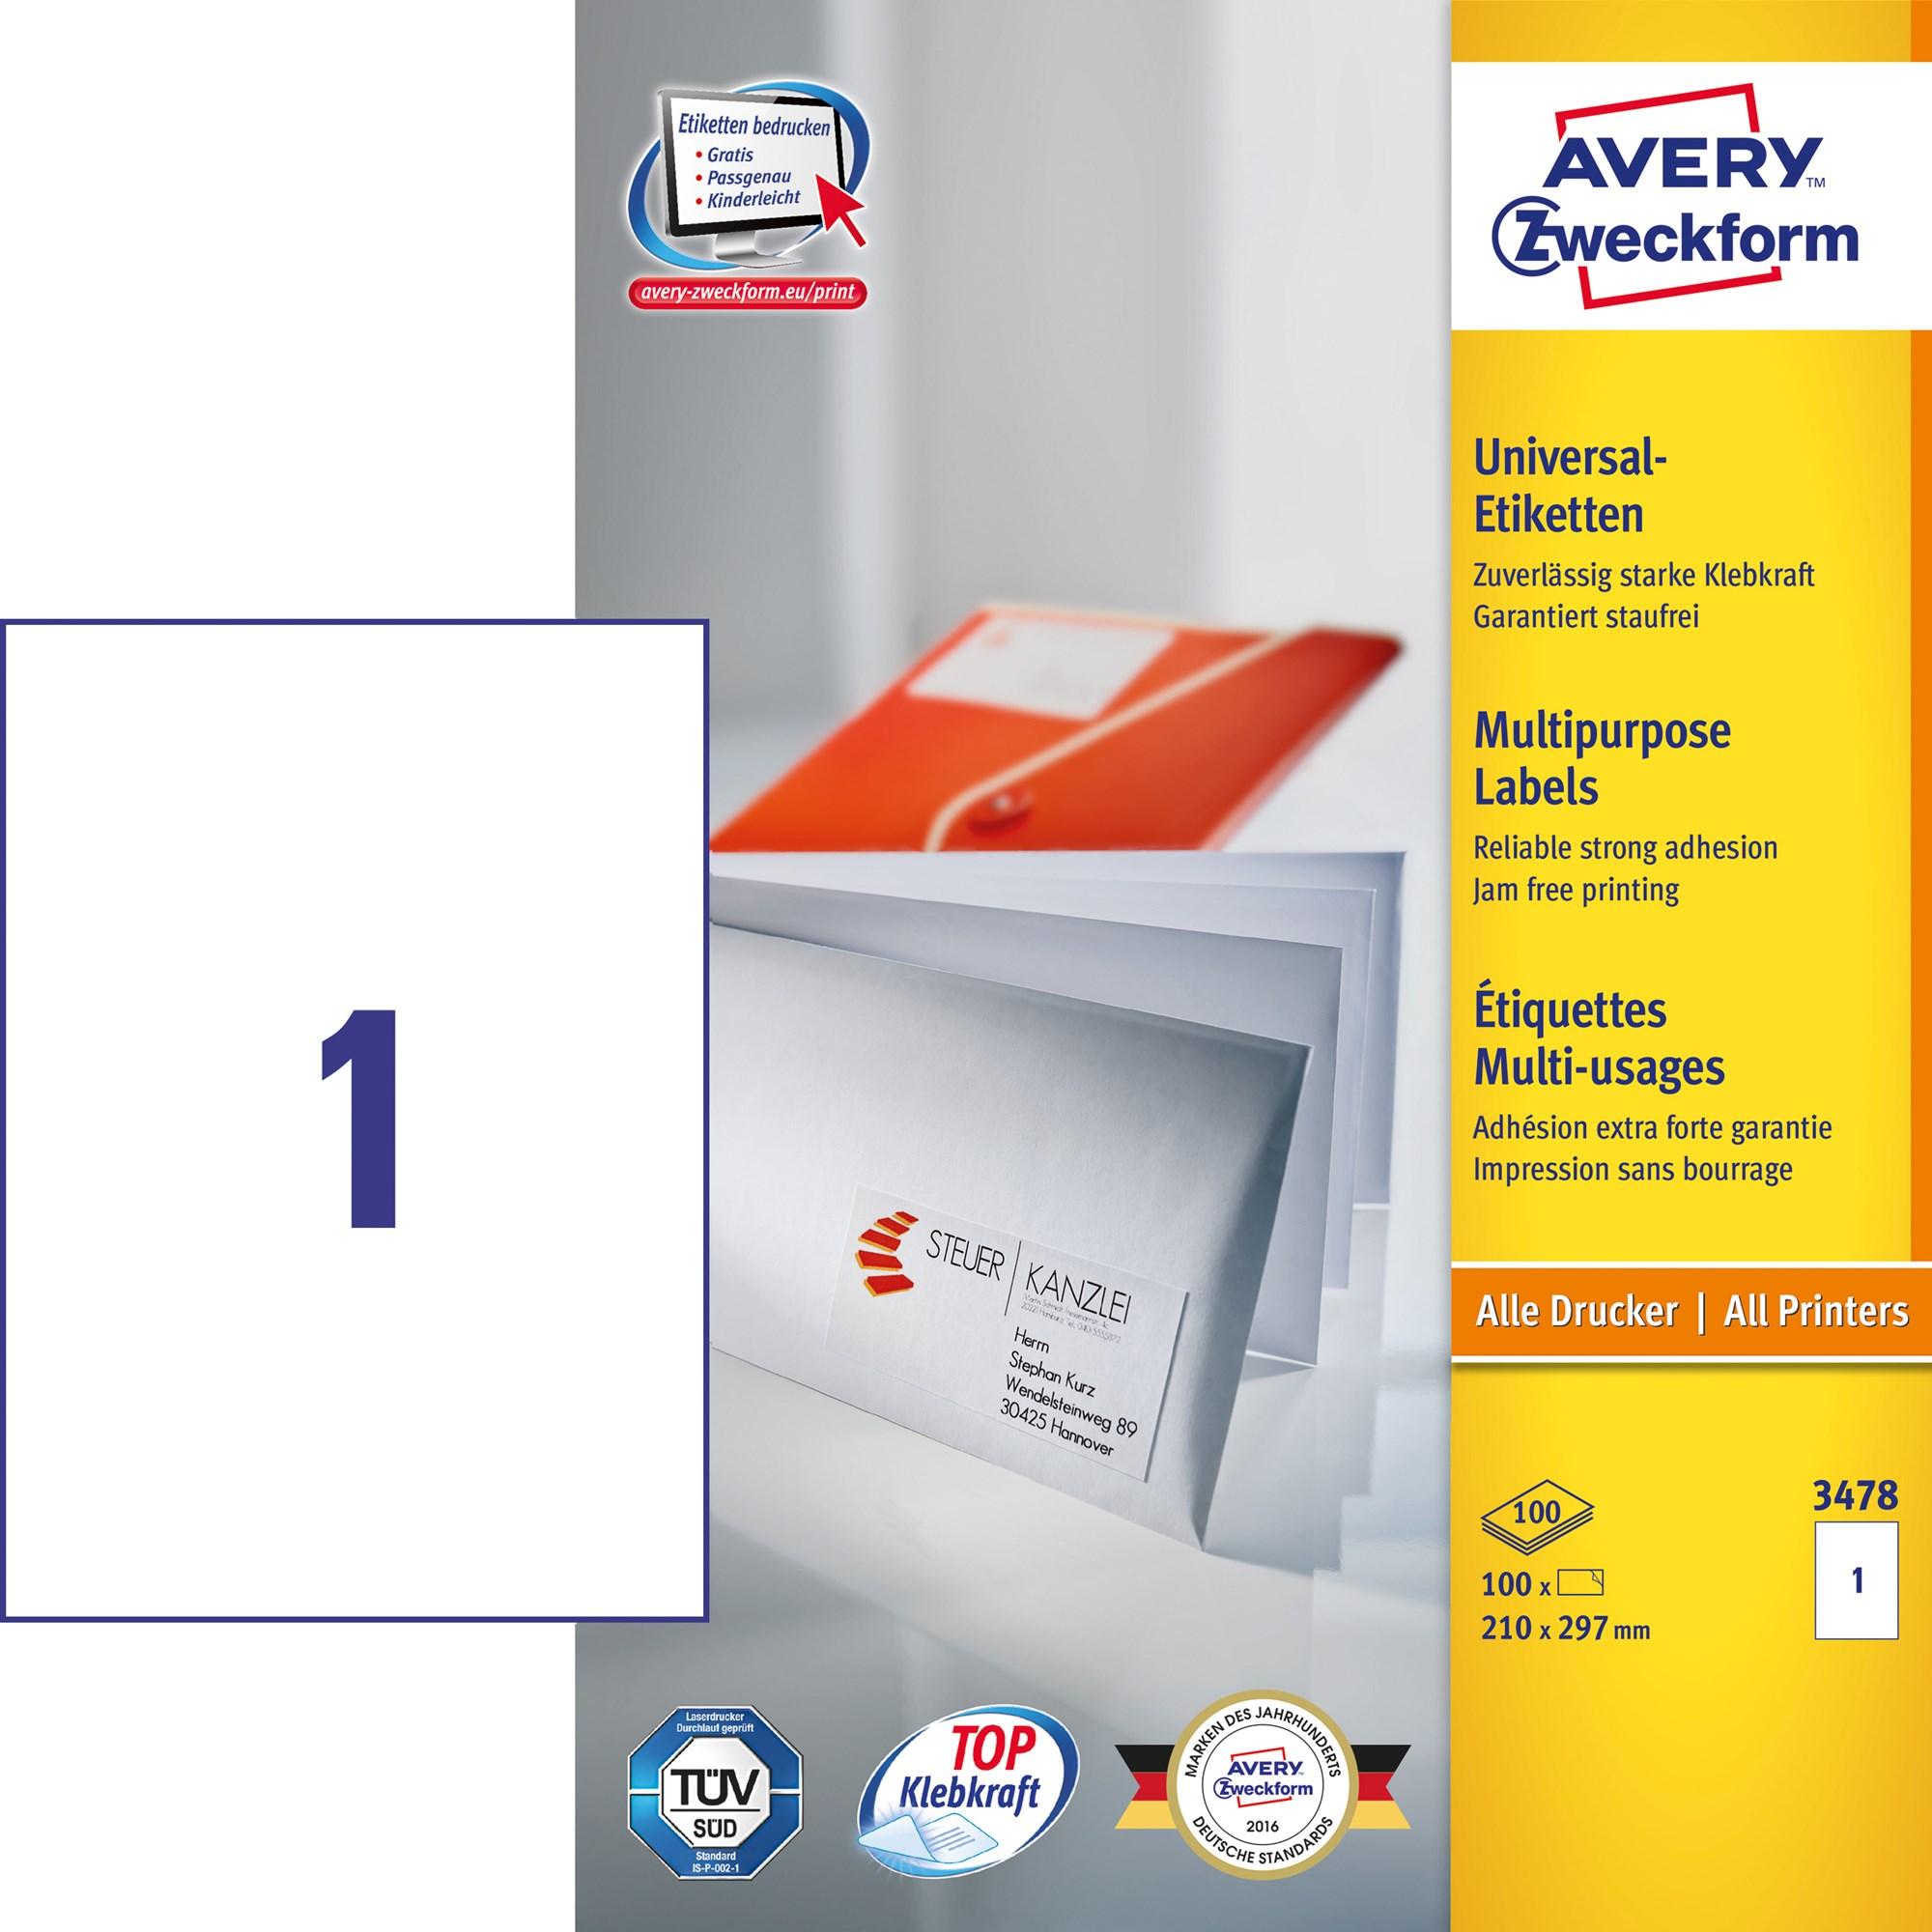 Image of Avery ILC universal etiket 210x297mm (100)